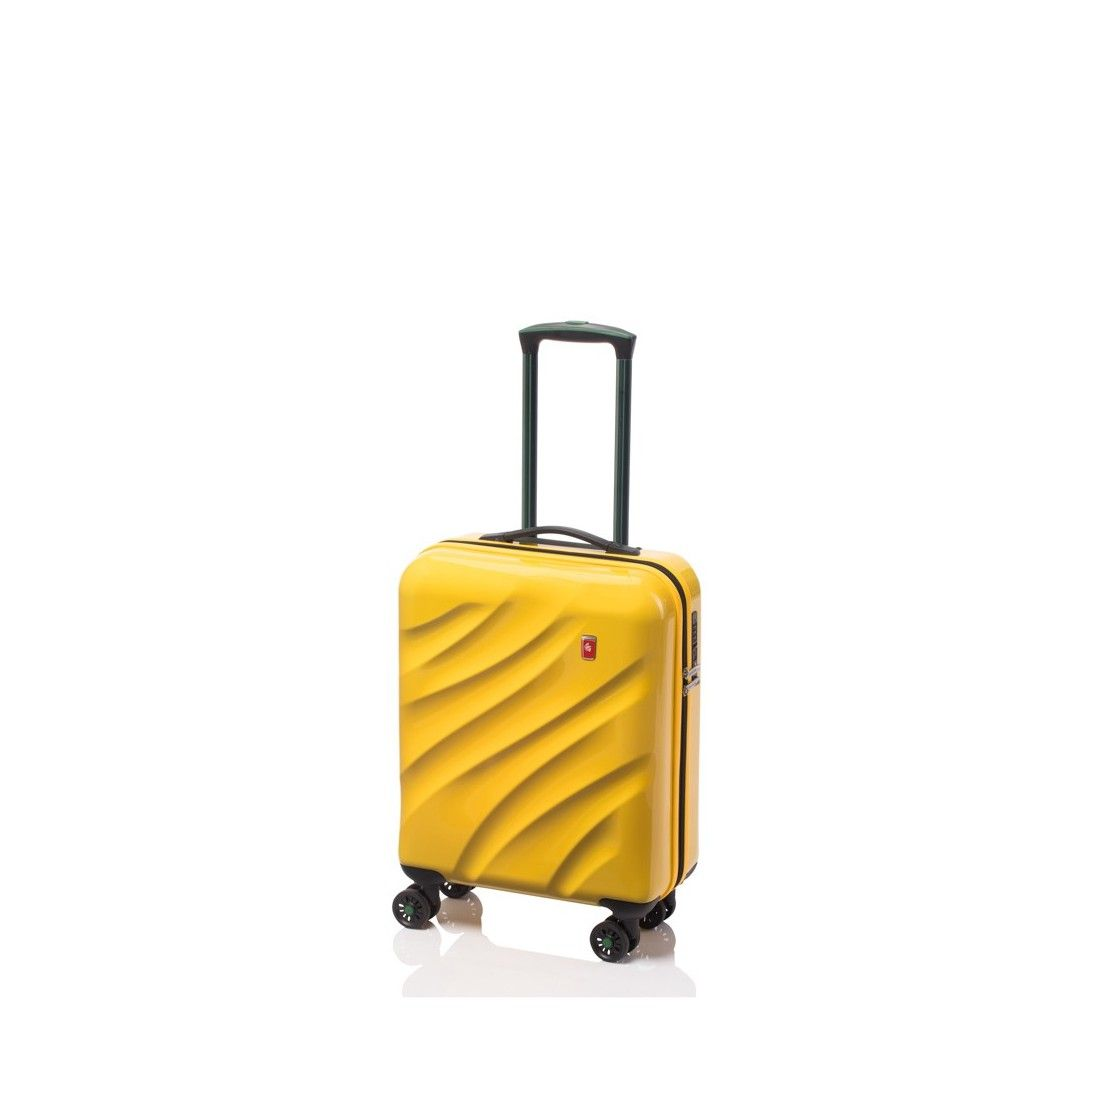 Gladiator Space maleta amarilla maleta rígida maleta spinner